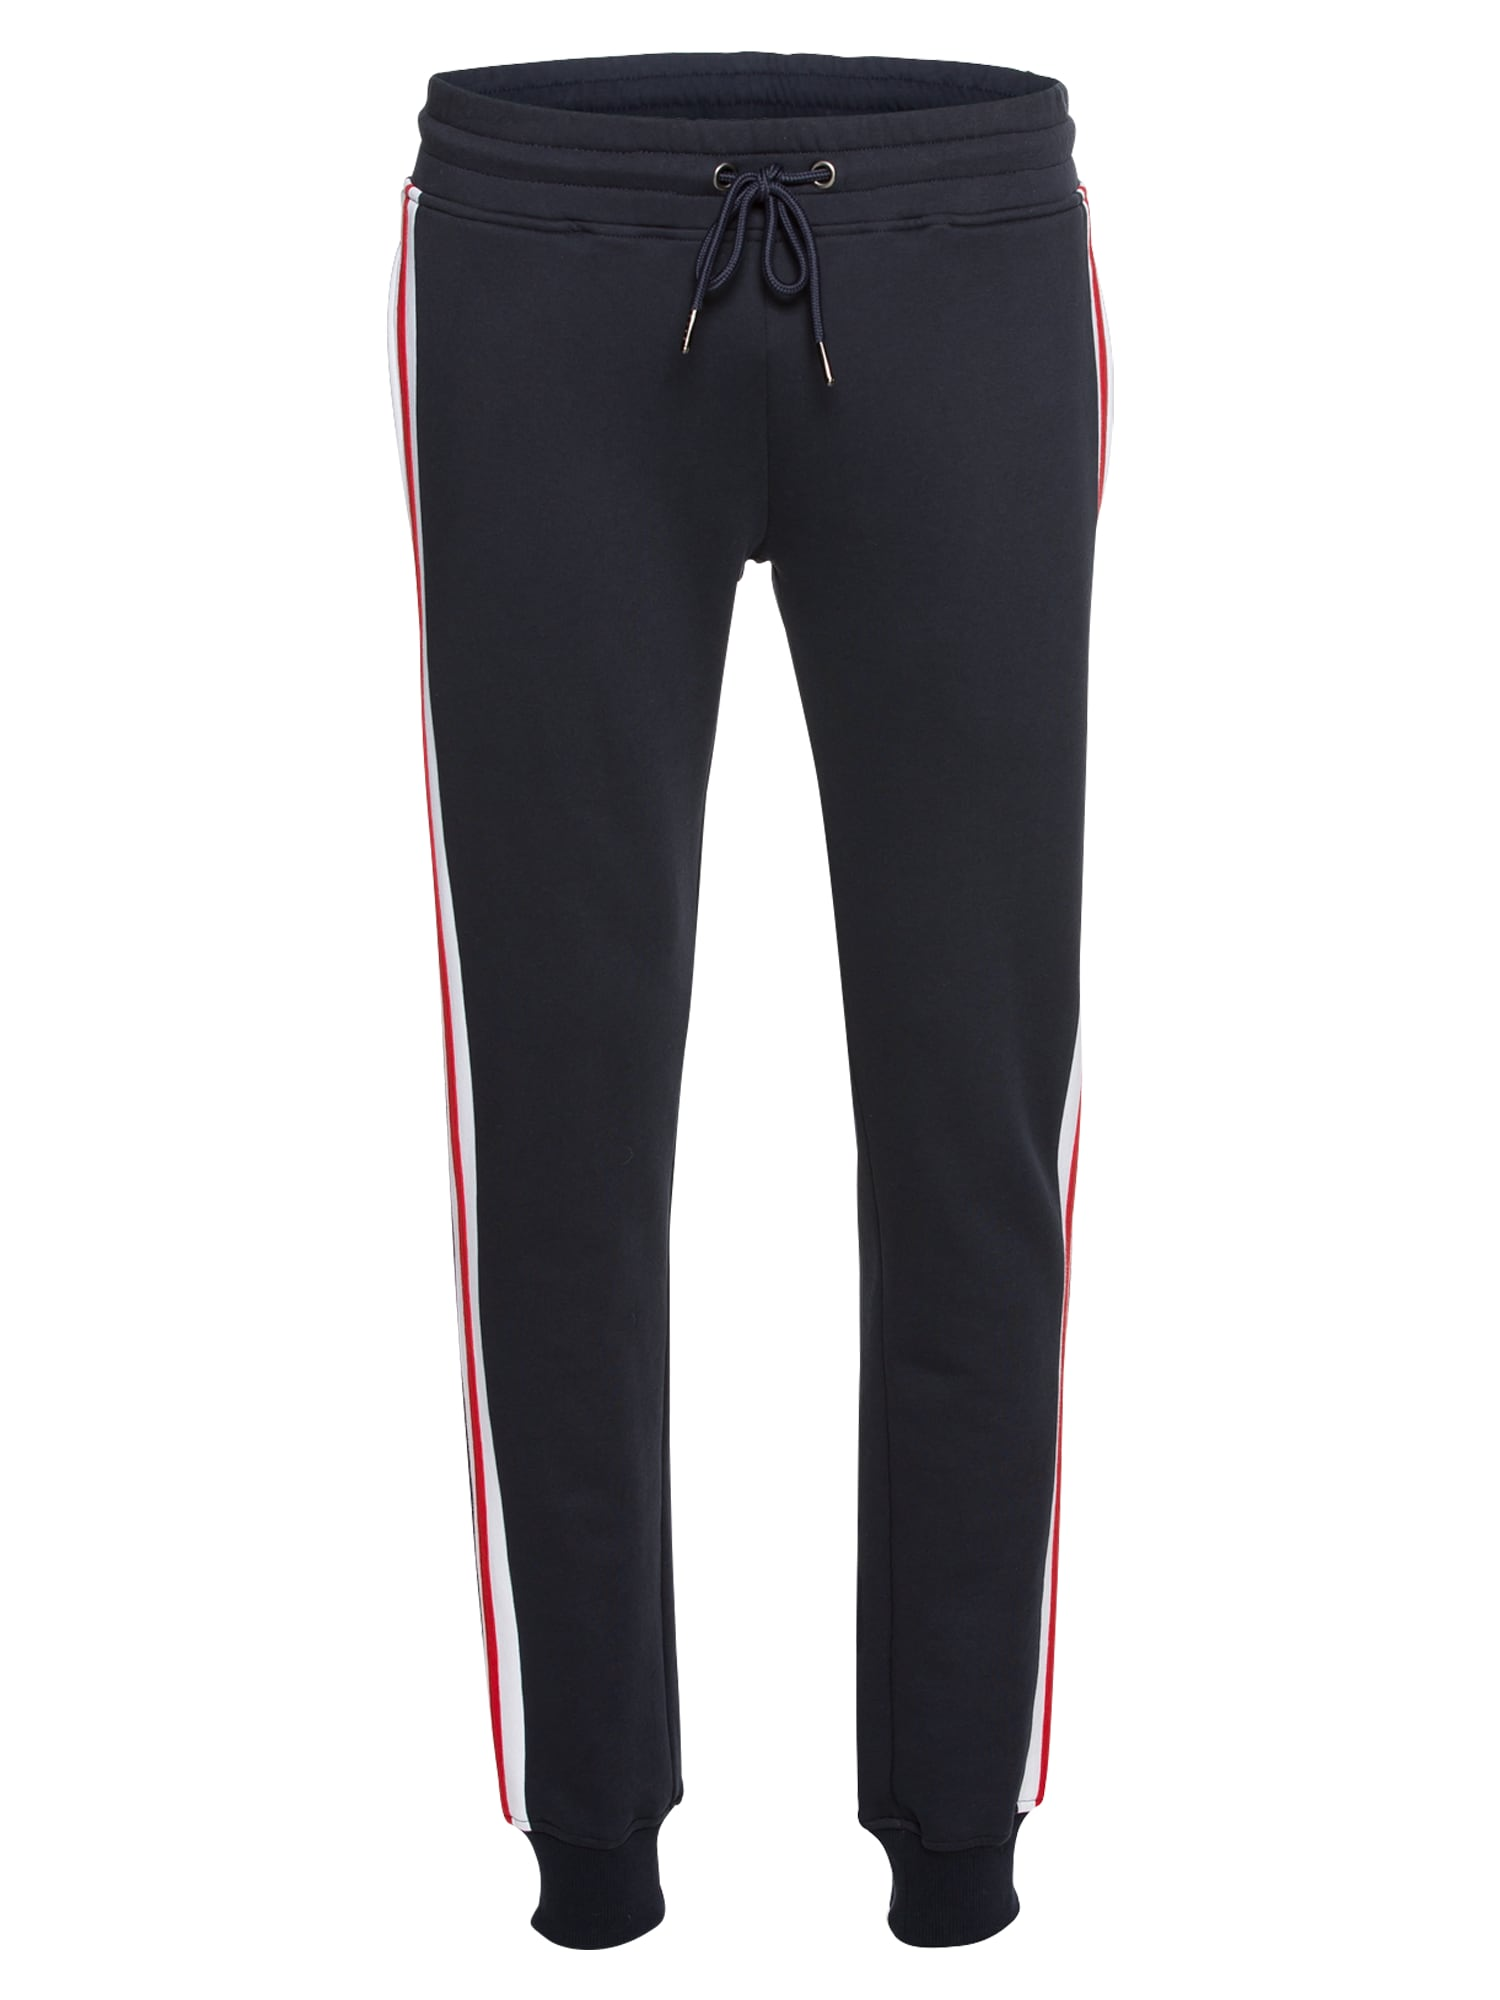 Urban Classics Kelnės tamsiai mėlyna / raudona / balta